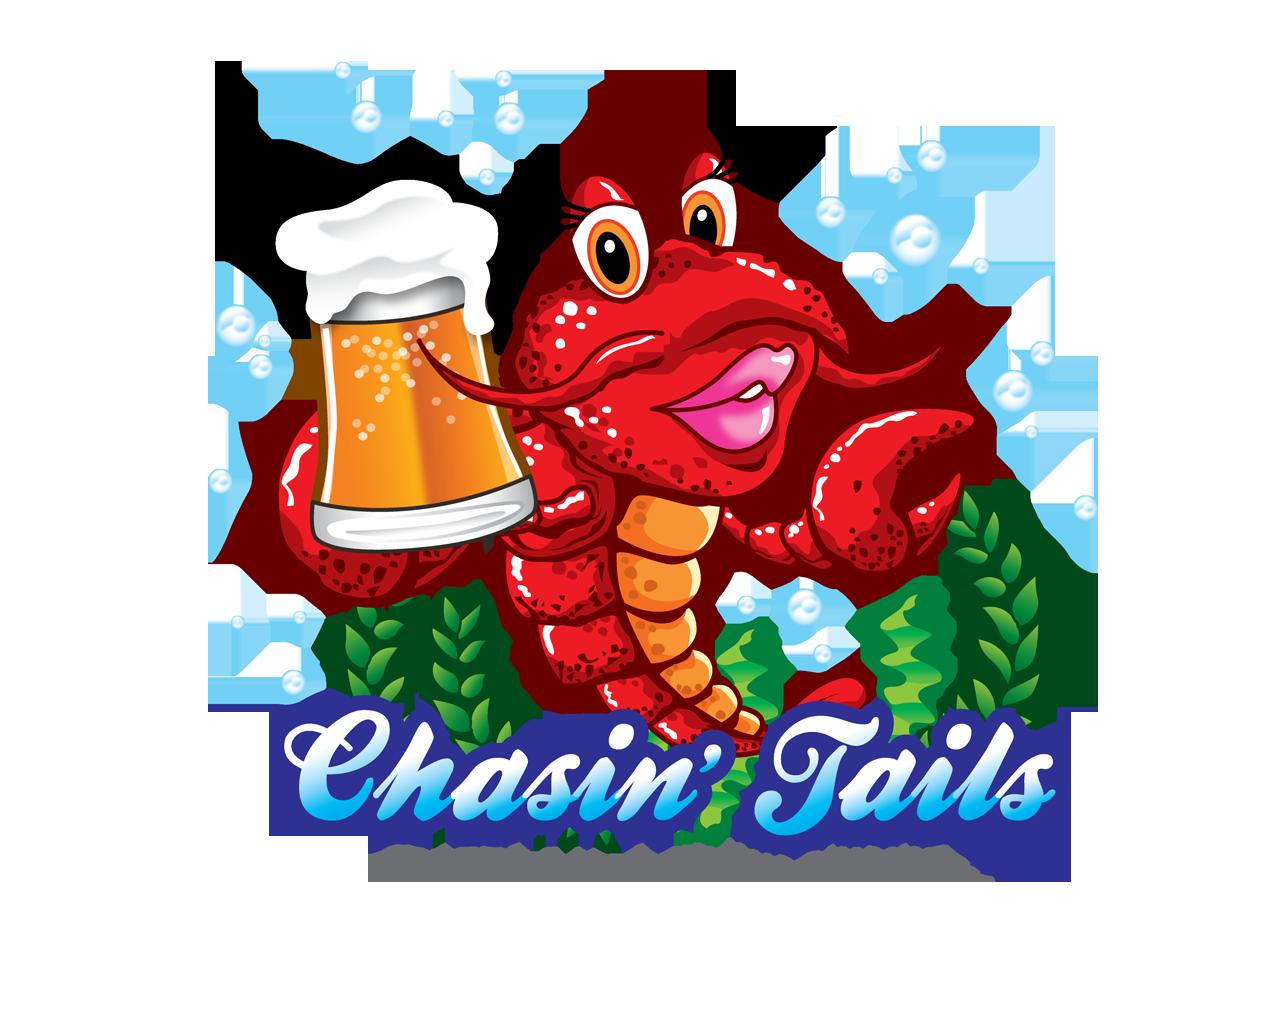 Crawfish clipart ragin cajun. Chasin tails